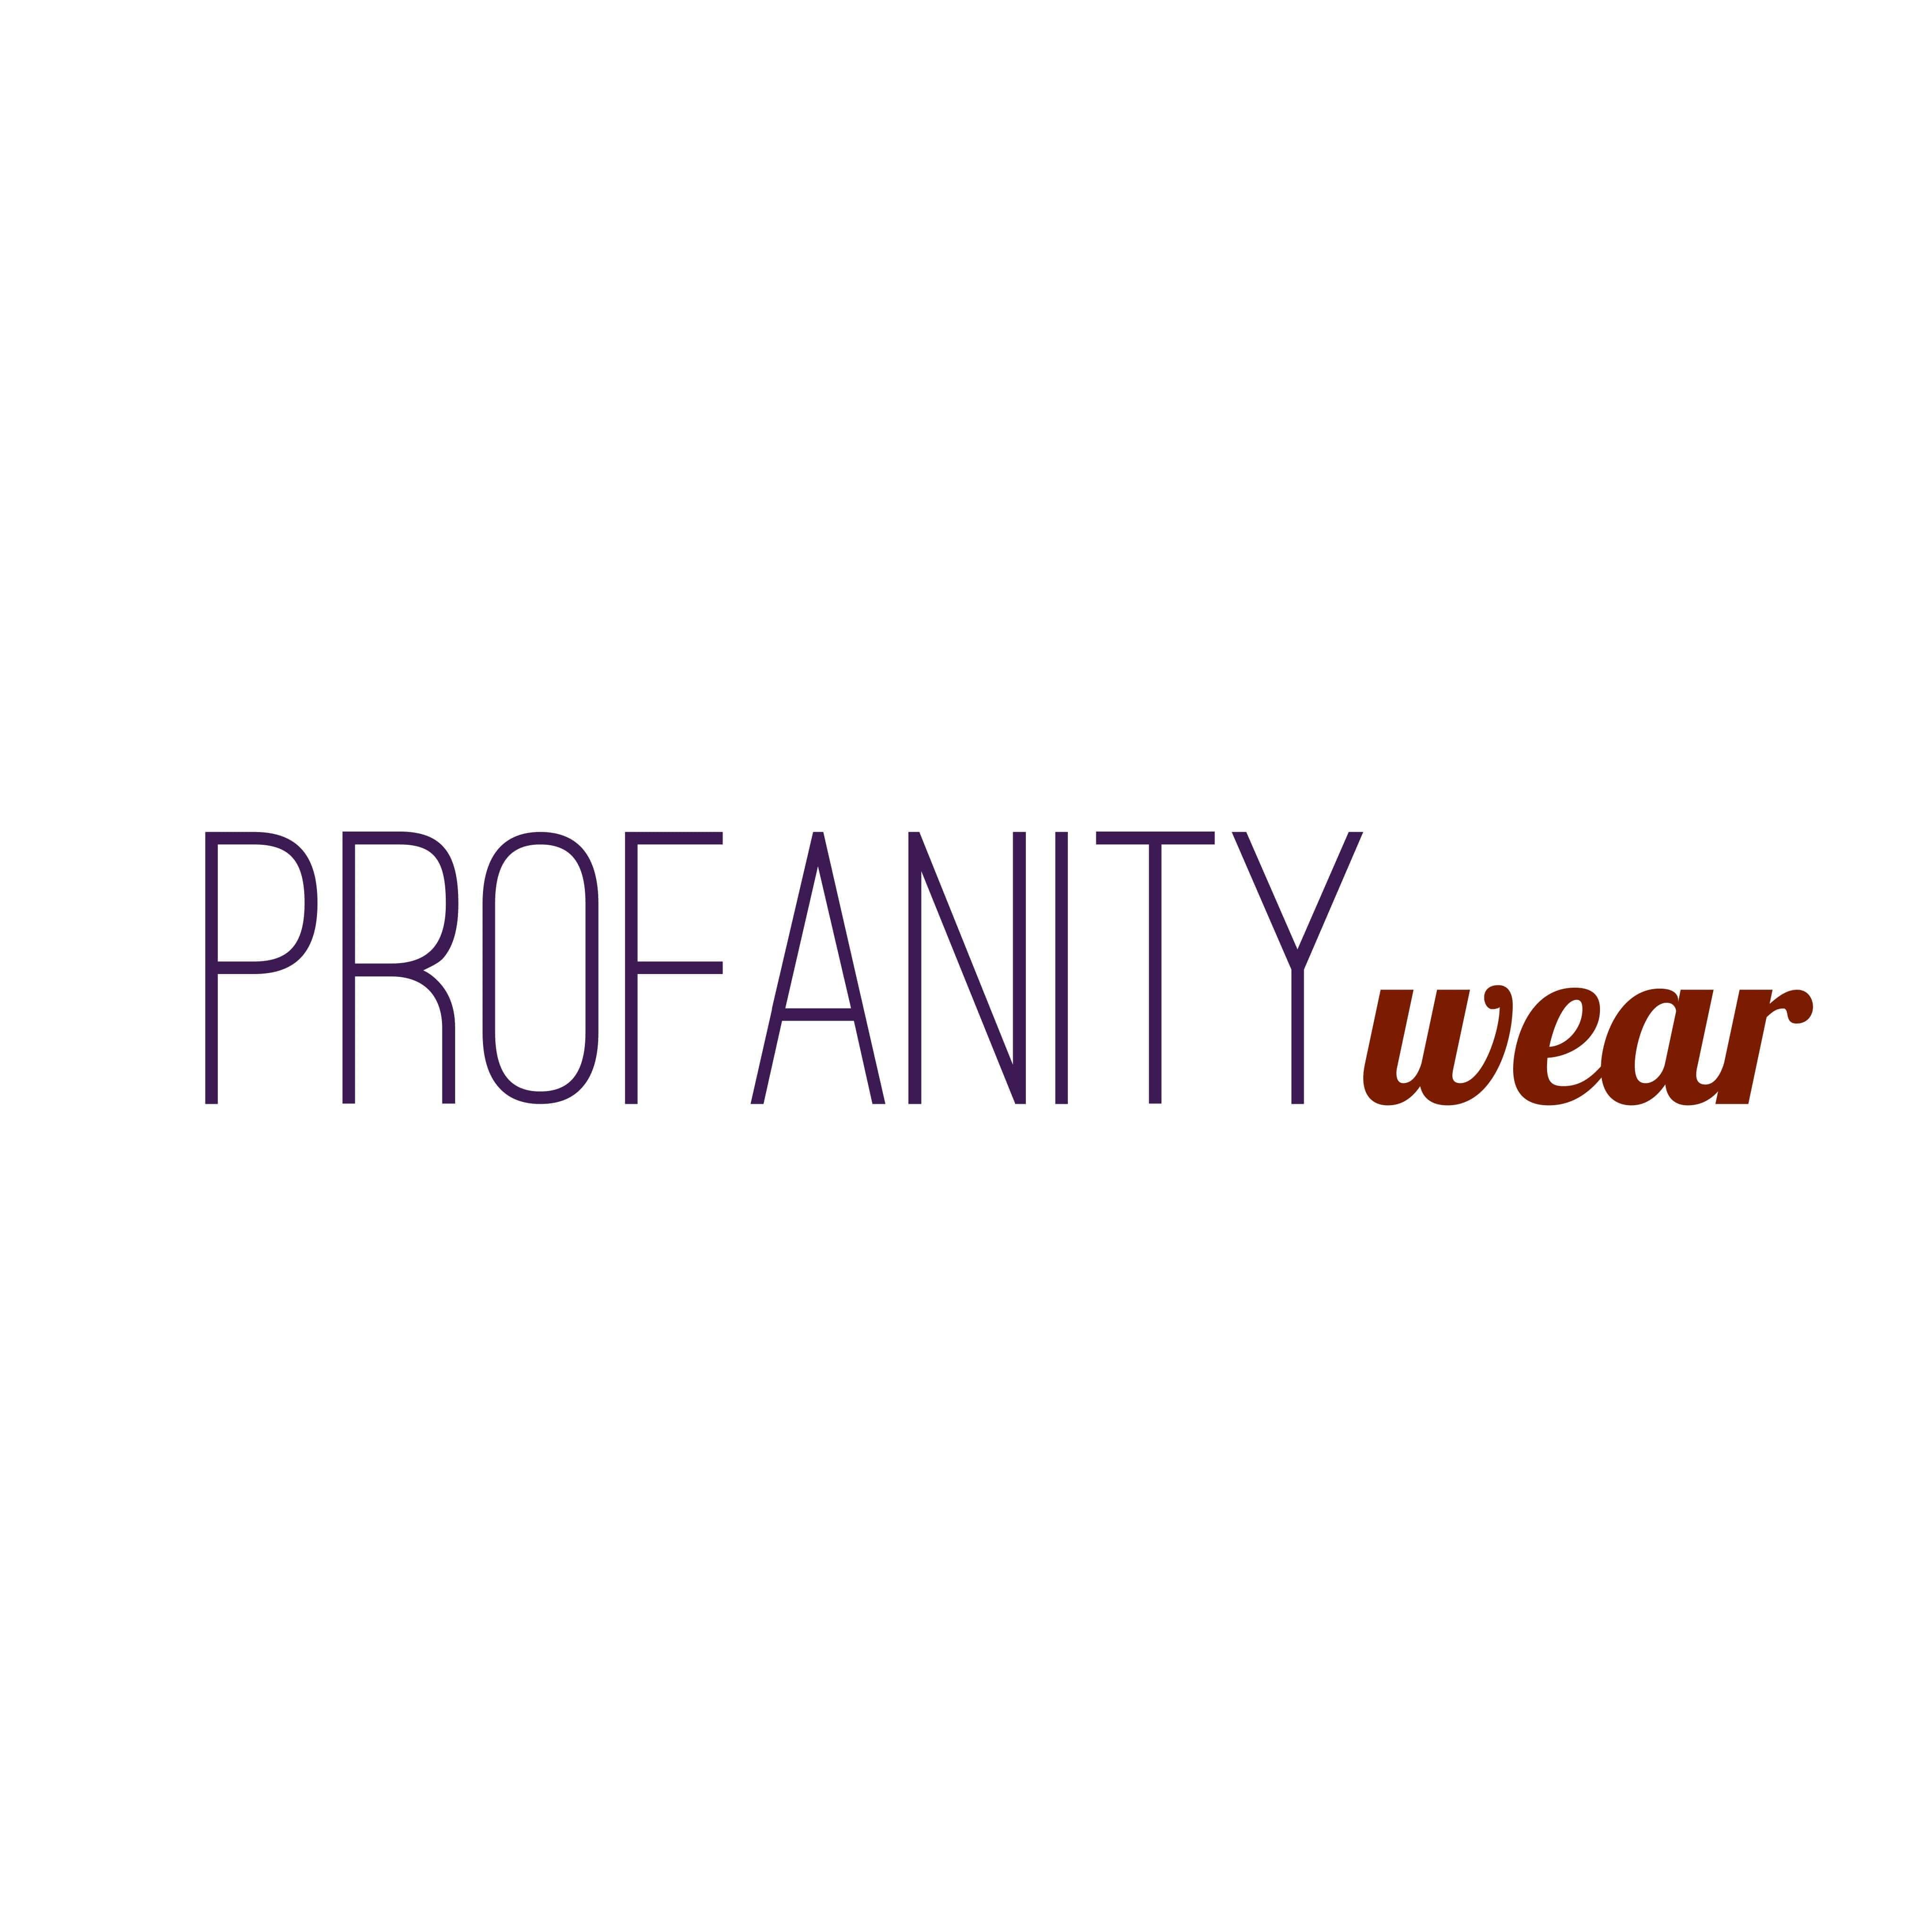 ProfanityWear